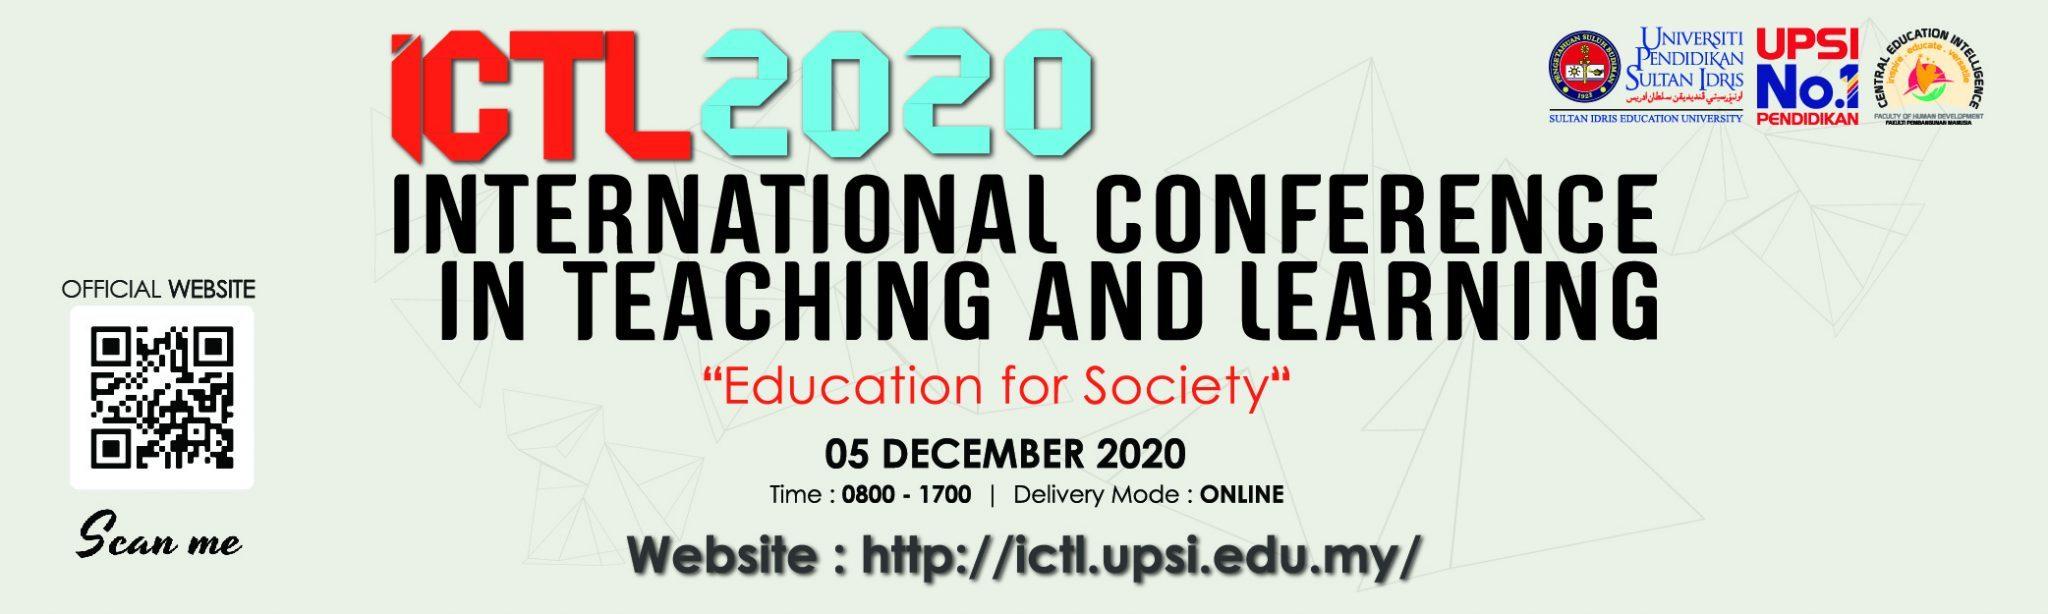 http://www.upsi.edu.my/wp-content/uploads/2020/09/ICTL-Banner-01.jpg